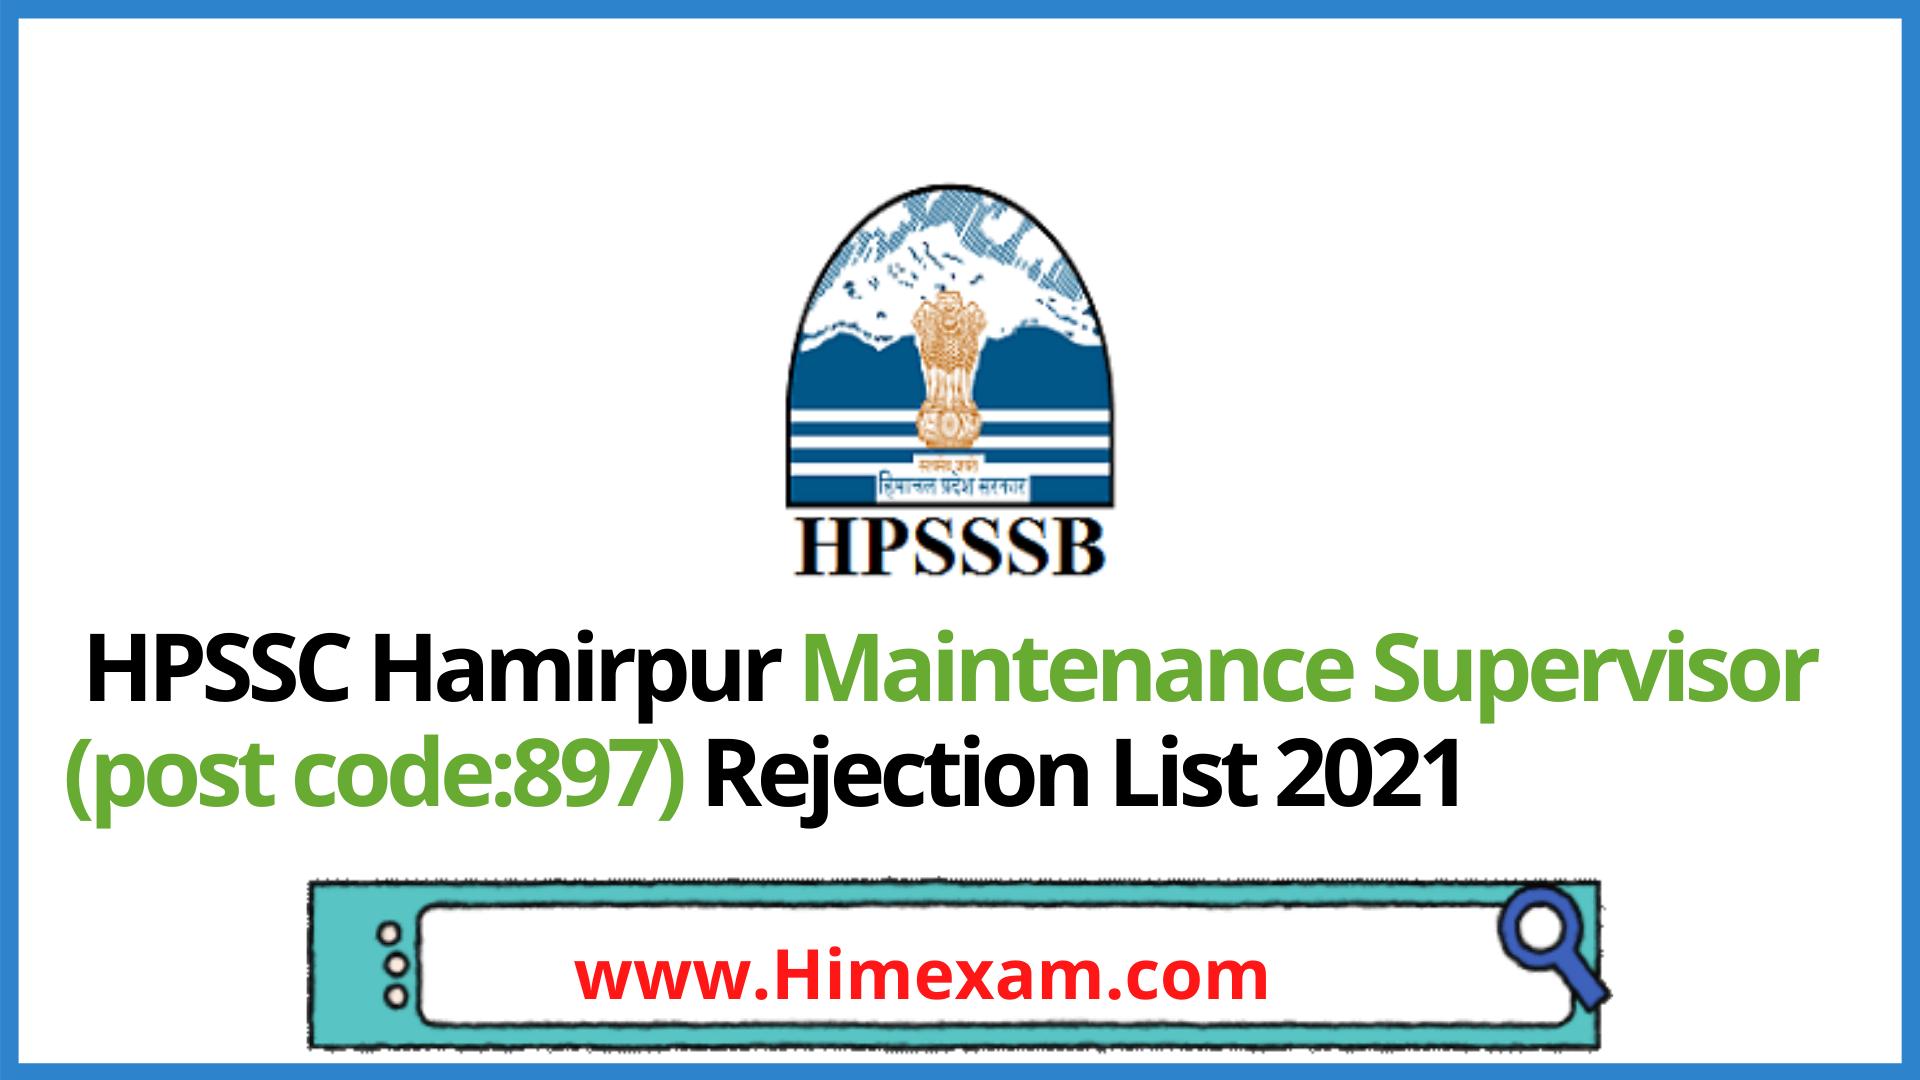 HPSSC Hamirpur Maintenance Supervisor (post code:897) Rejection List 2021